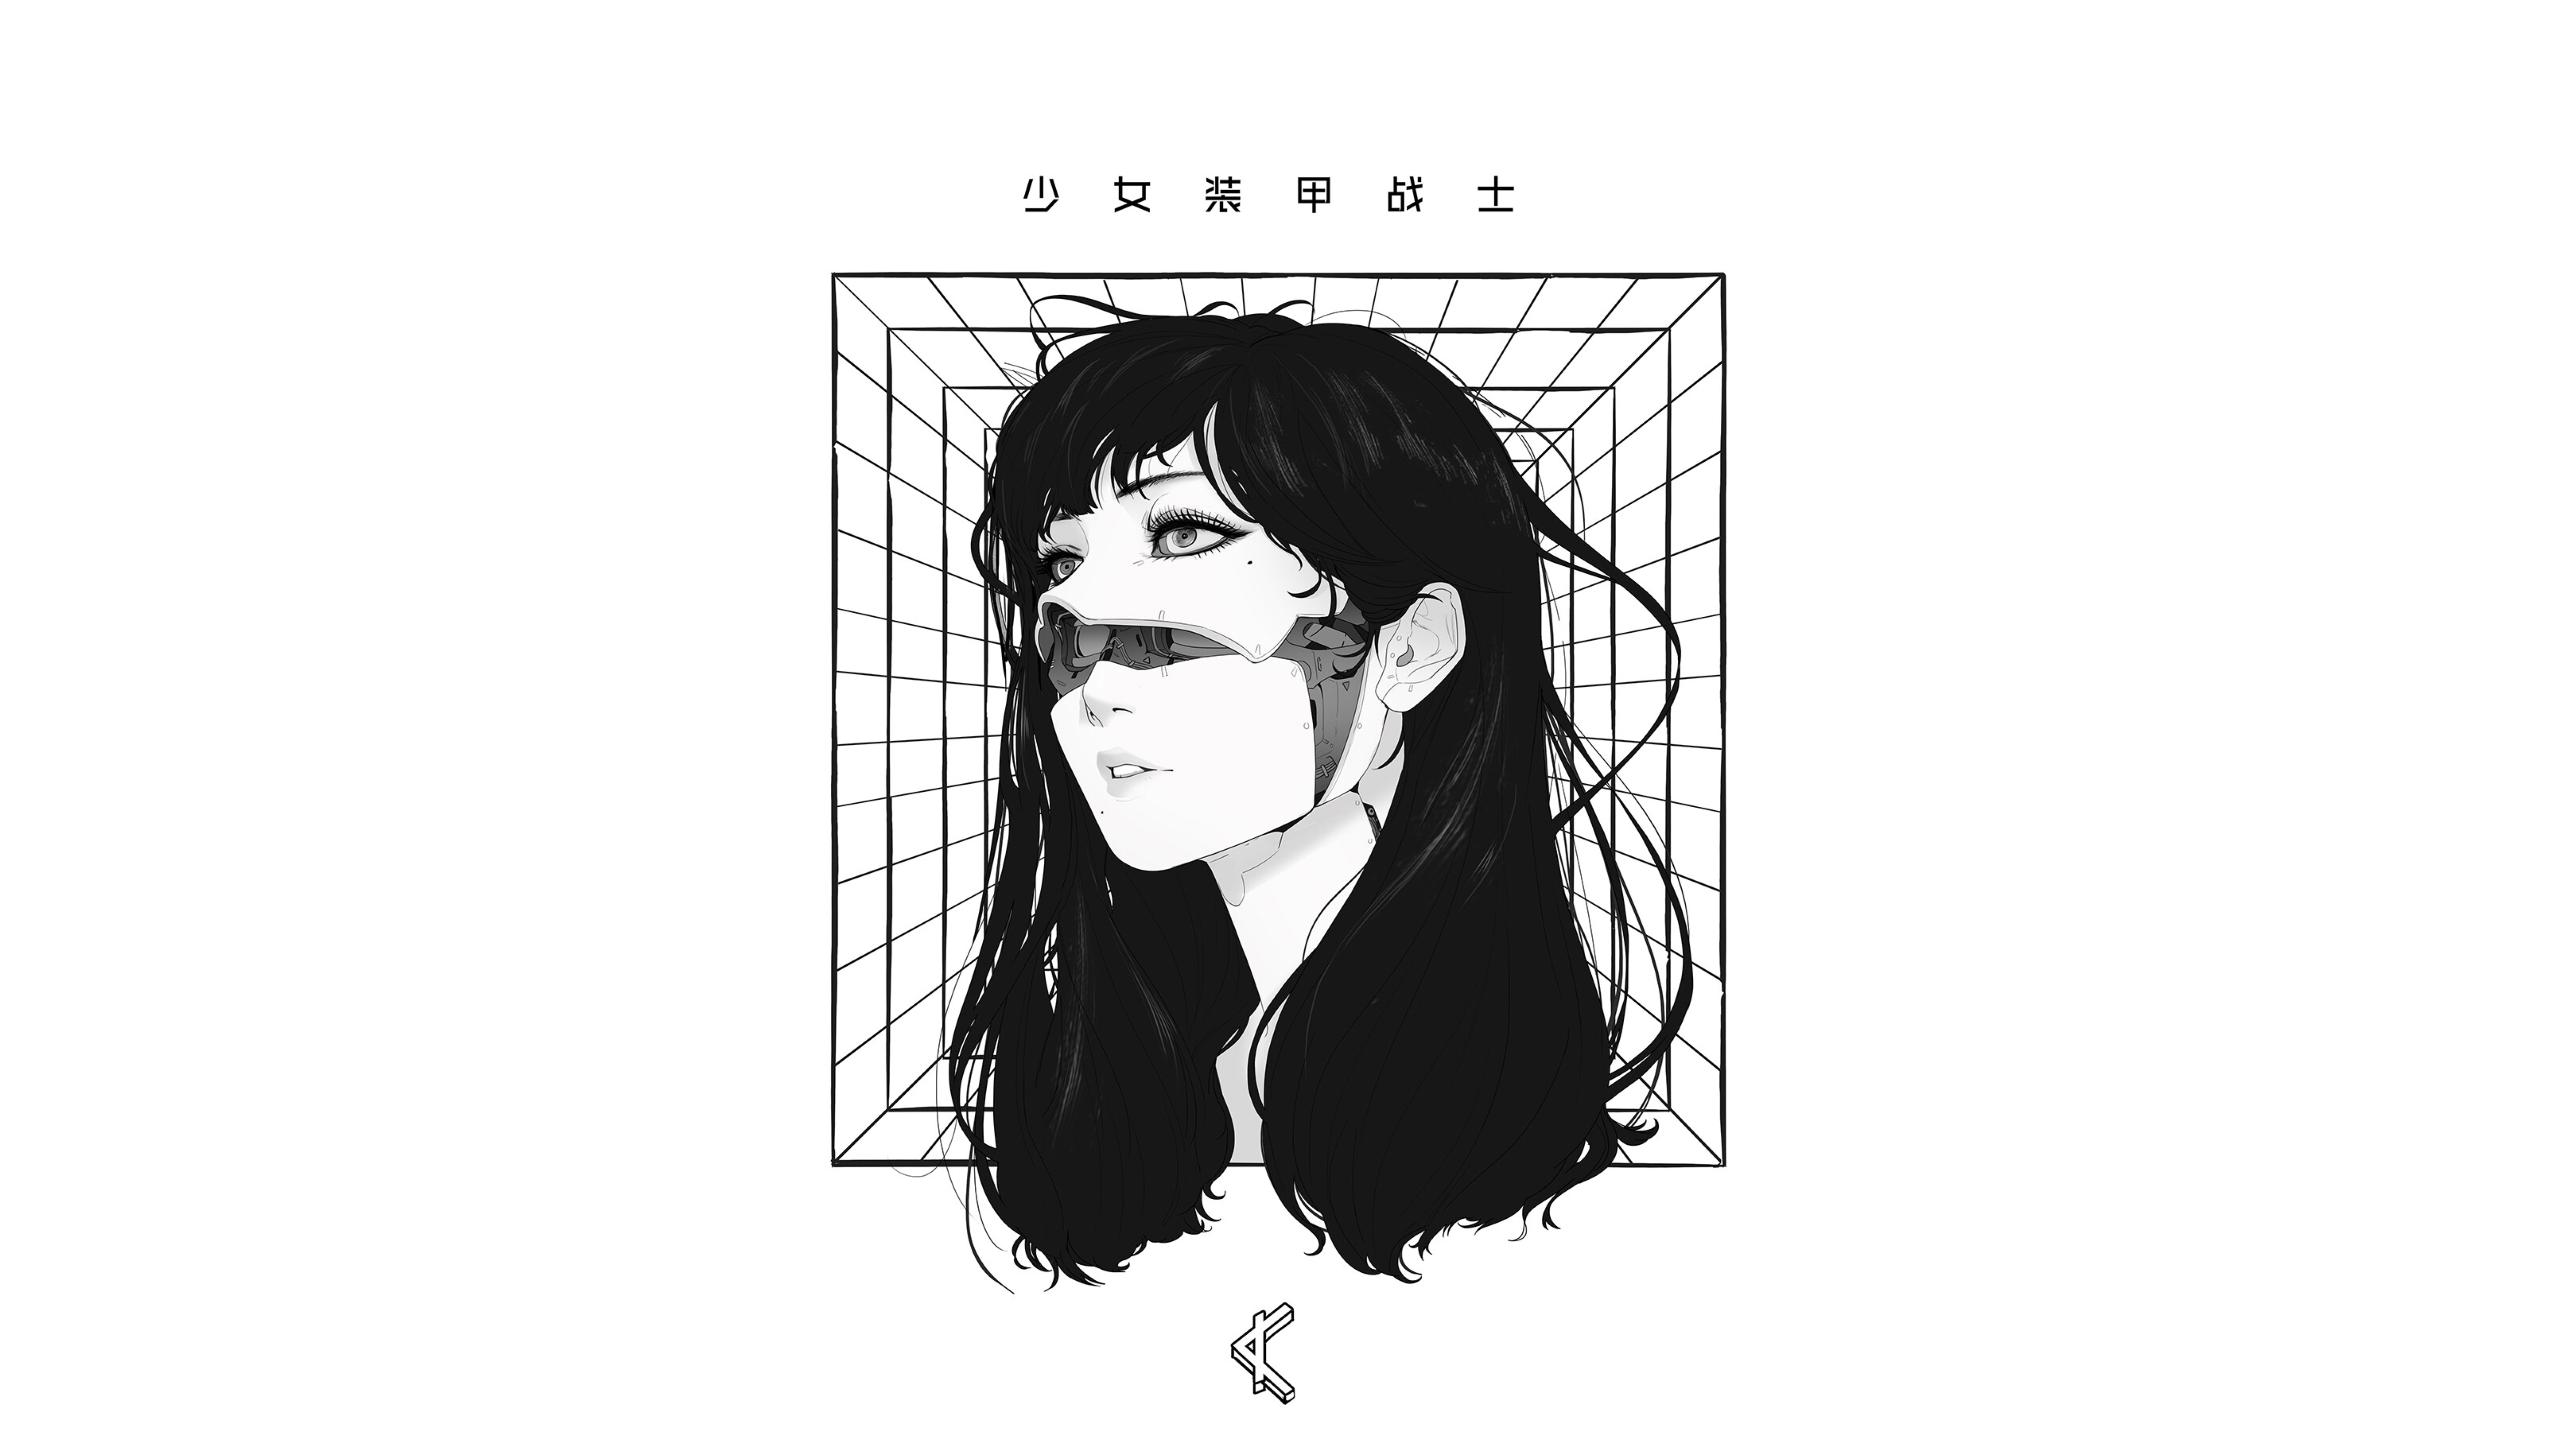 Wallpaper : Park JunKyu, women, cyborg, futuristic ...